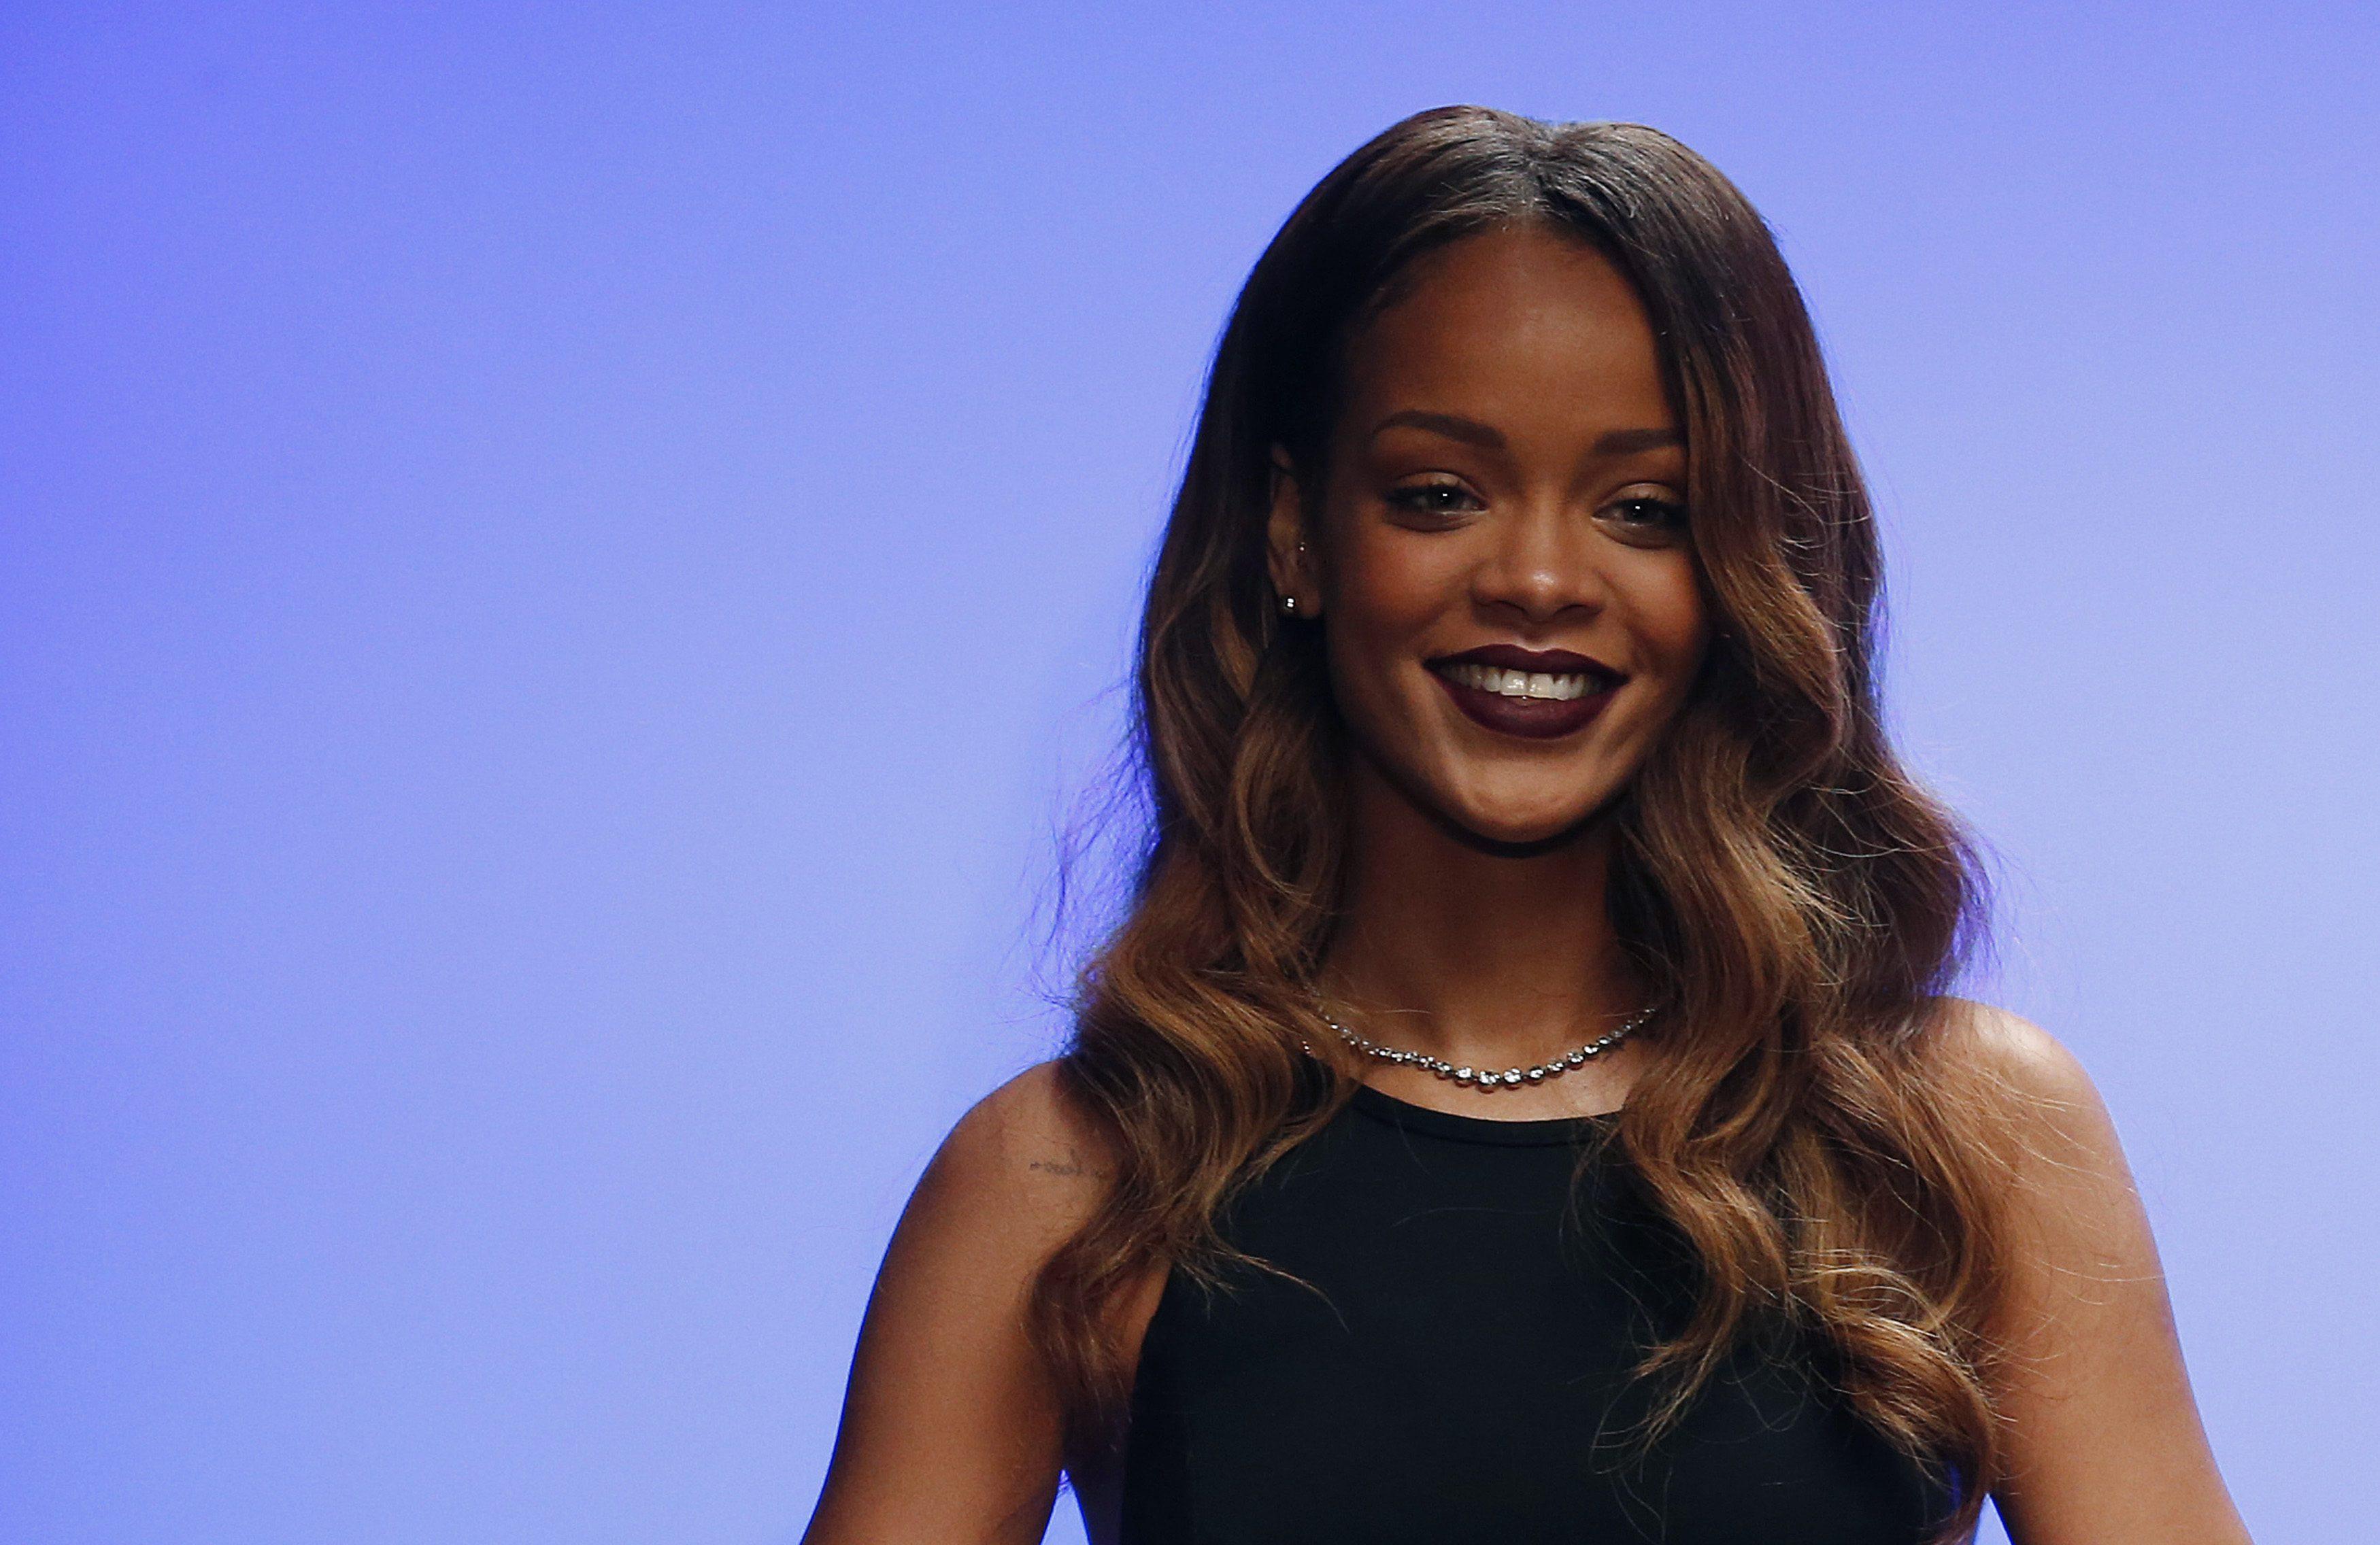 Gallery: Rihanna for River Island at London Fashion Week – 16 February 2013